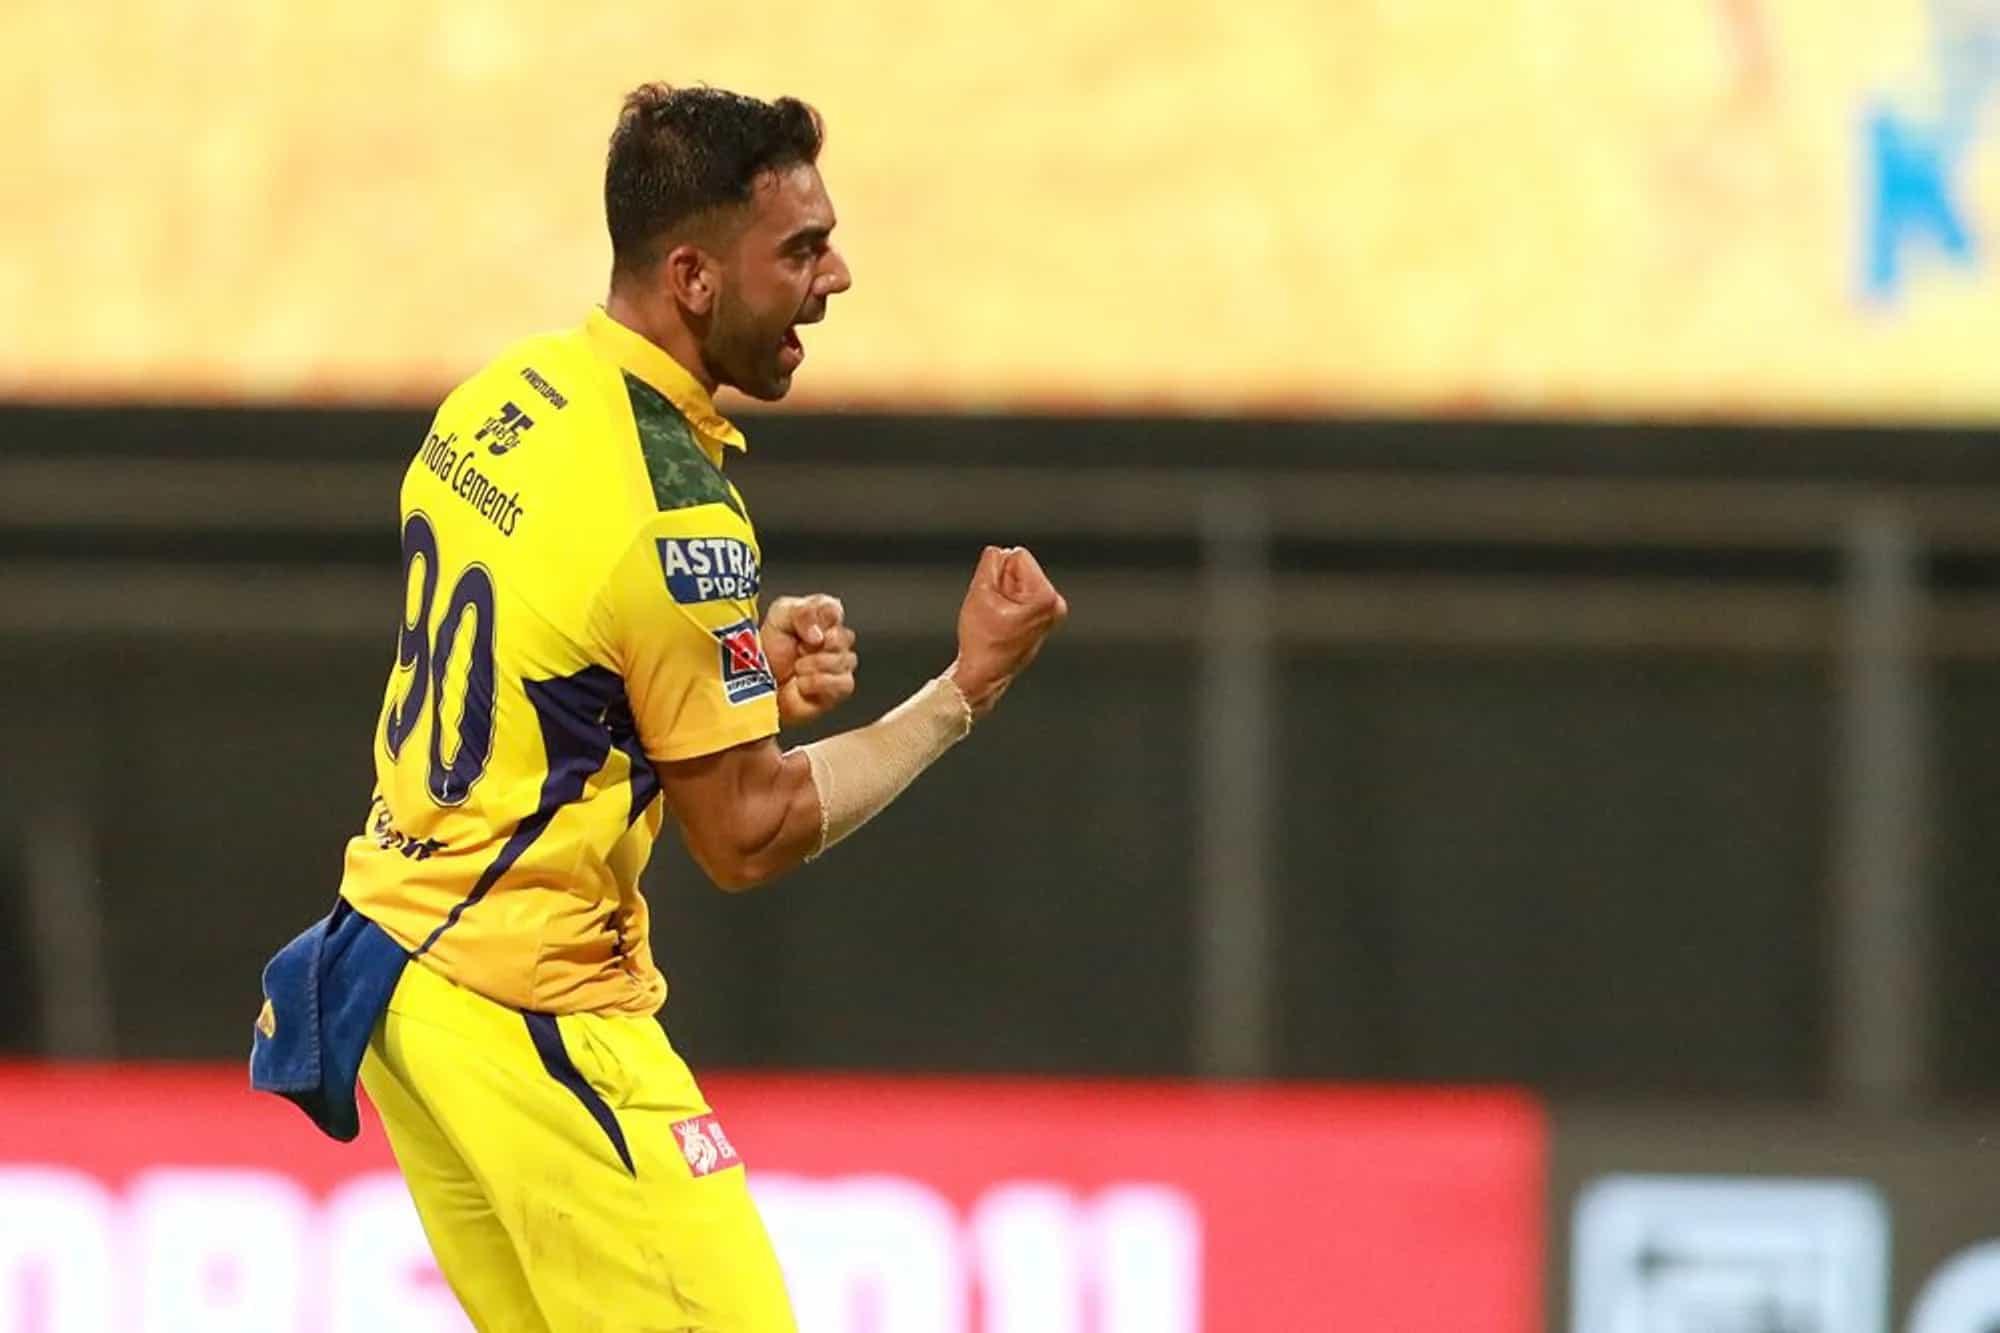 PBKS vs CSK: Deepak Chahar Registers His Best Bowling Figures in The IPL